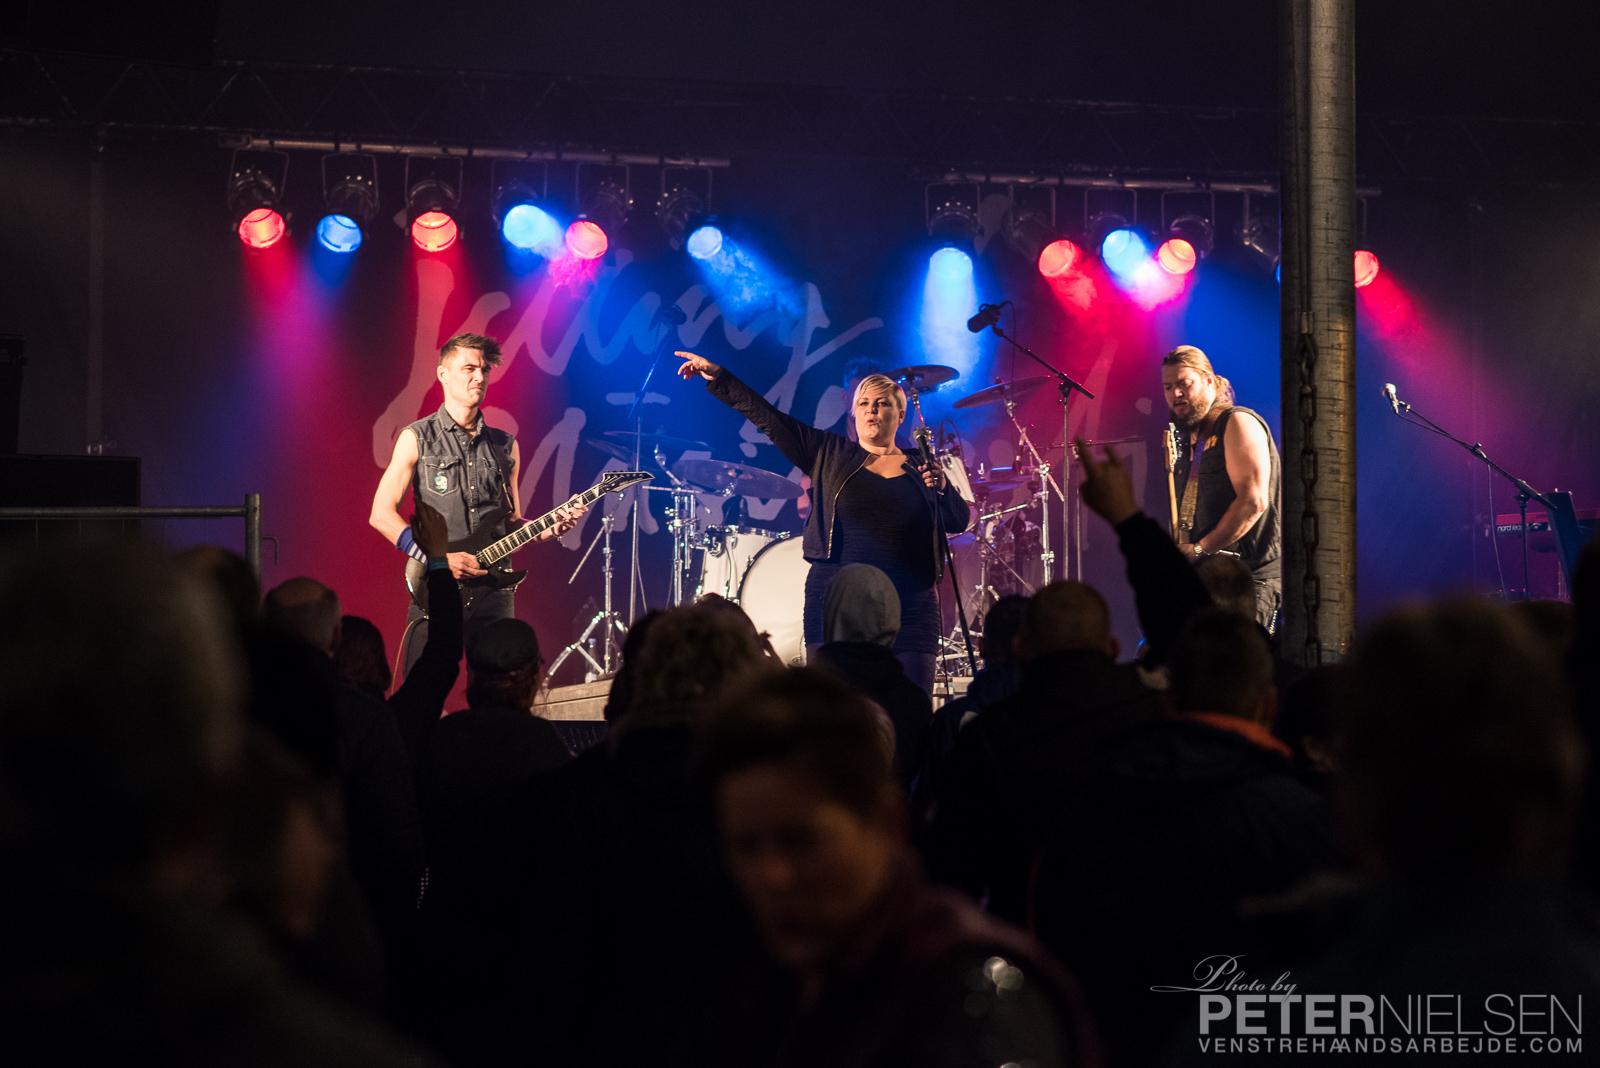 rock-the-night-52.jpg